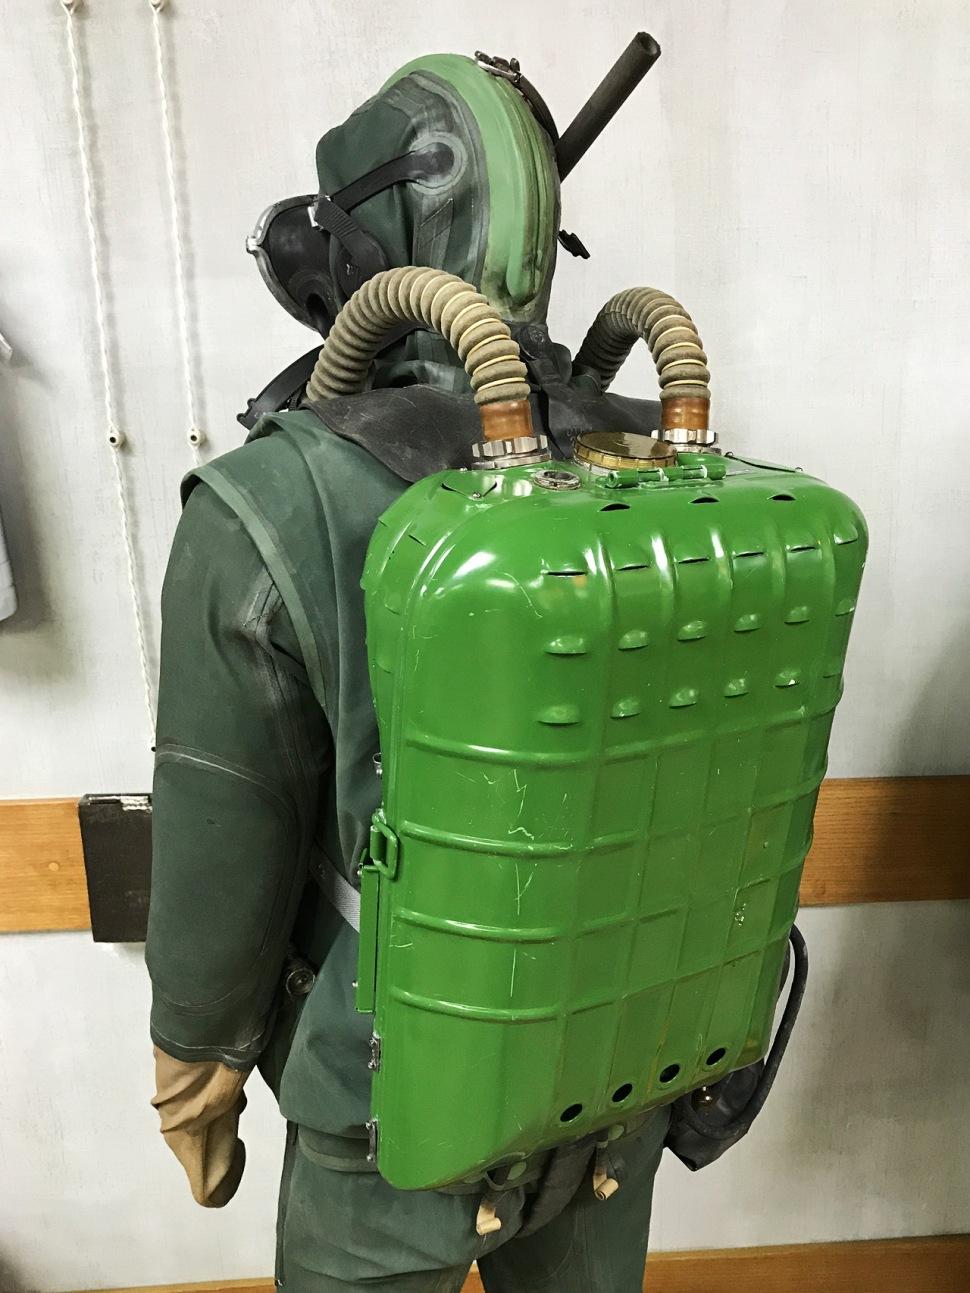 180627-panerai-gtg-moscow-paneristi-club-room-rebreather-IDA-71-closed